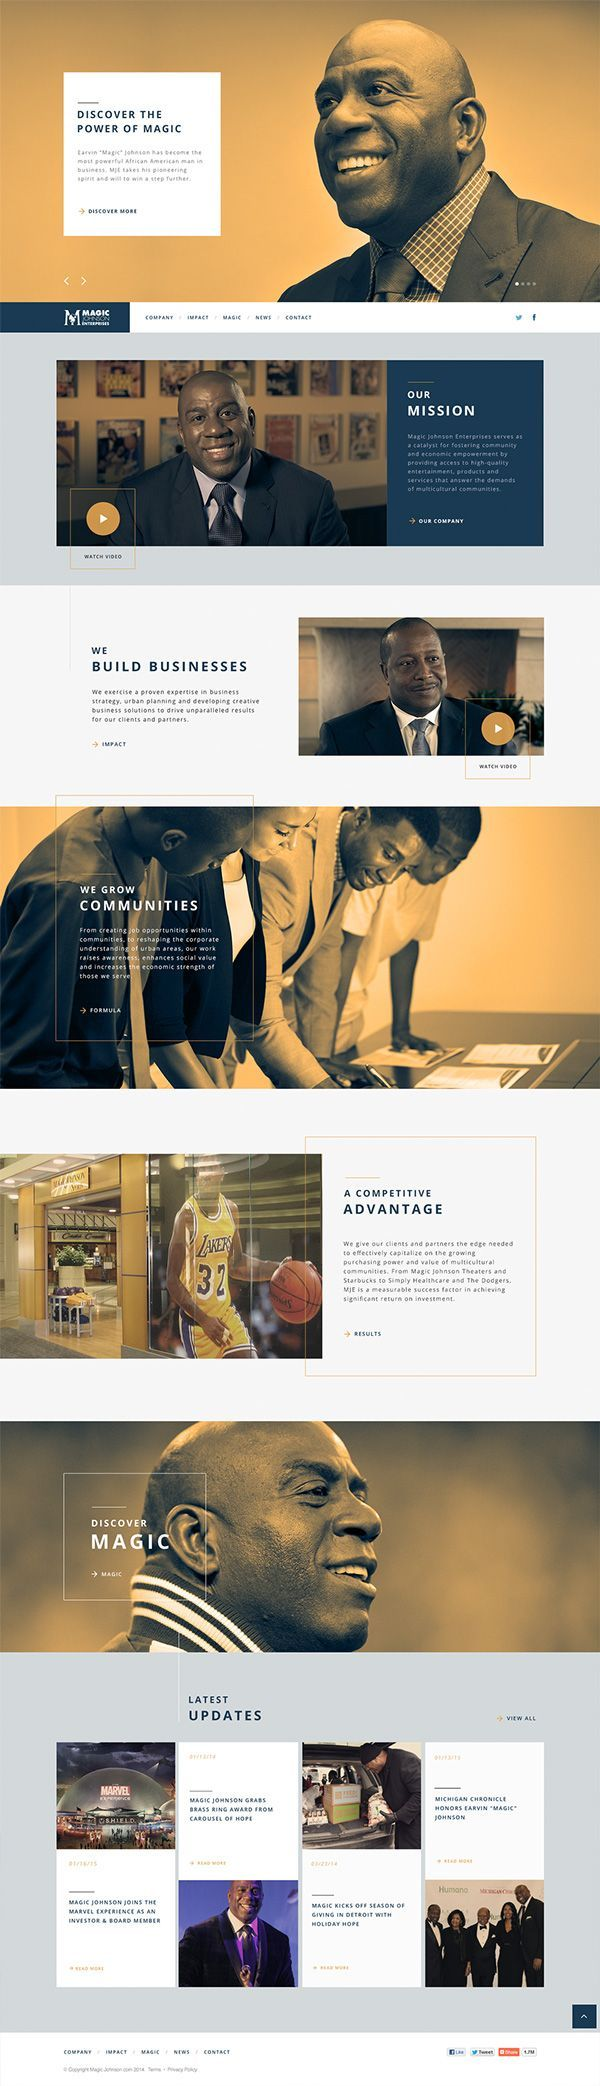 http://MagicJohnson.com on Web Design Served